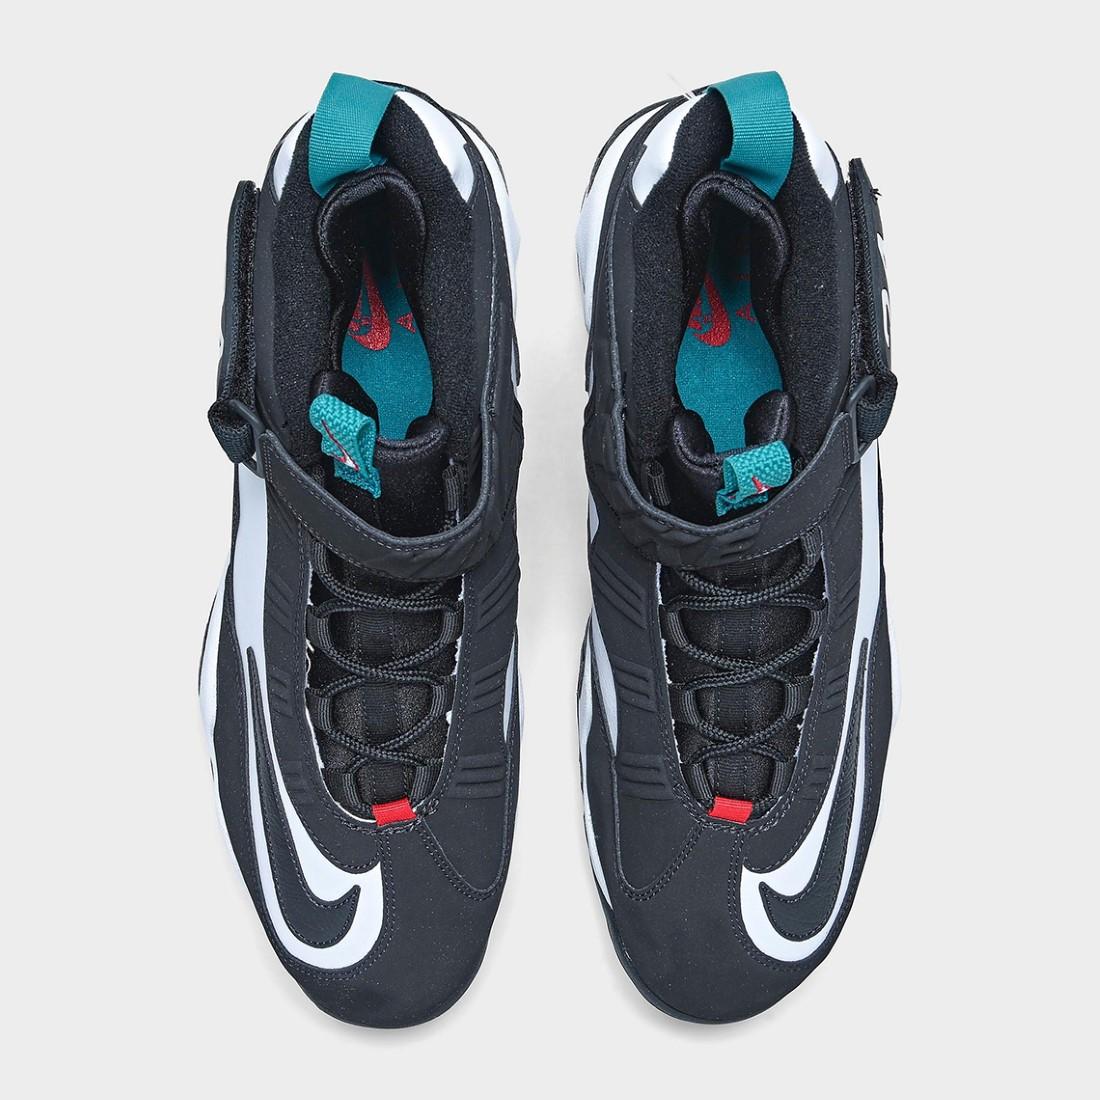 Nike Air Griffey Max 1 Freshwater